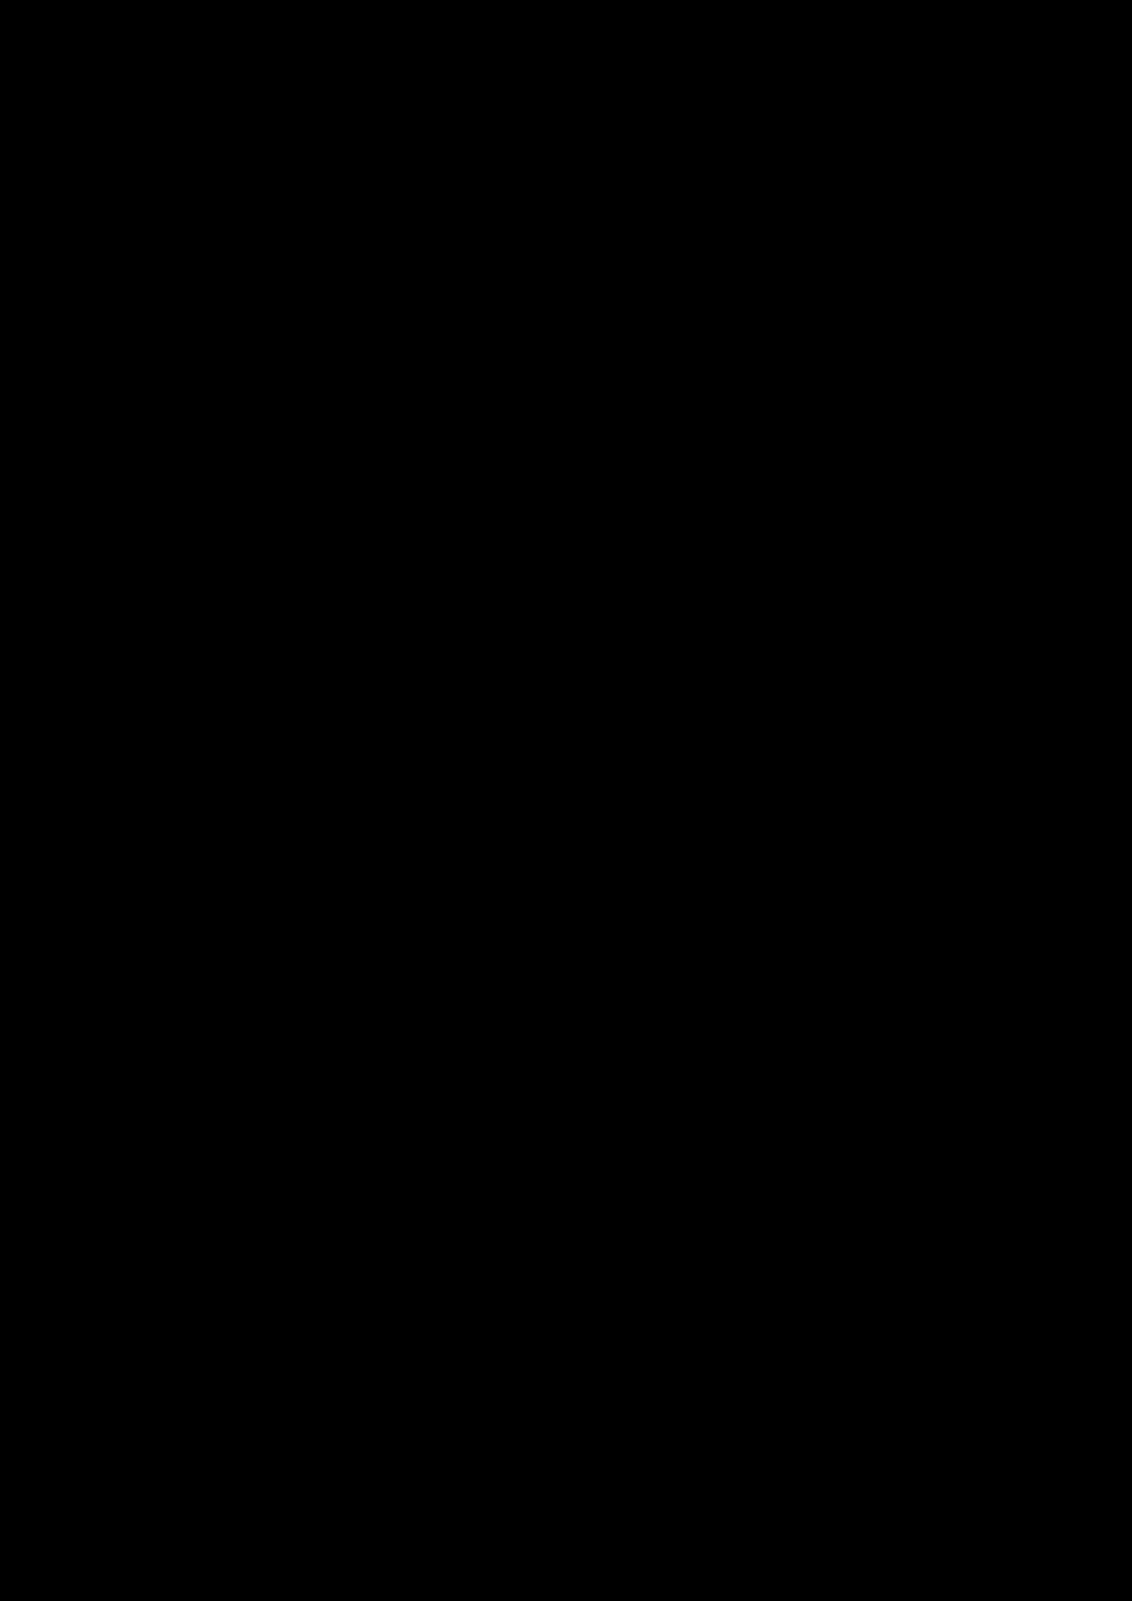 Deklassirovannyim elementam slide, Image 11